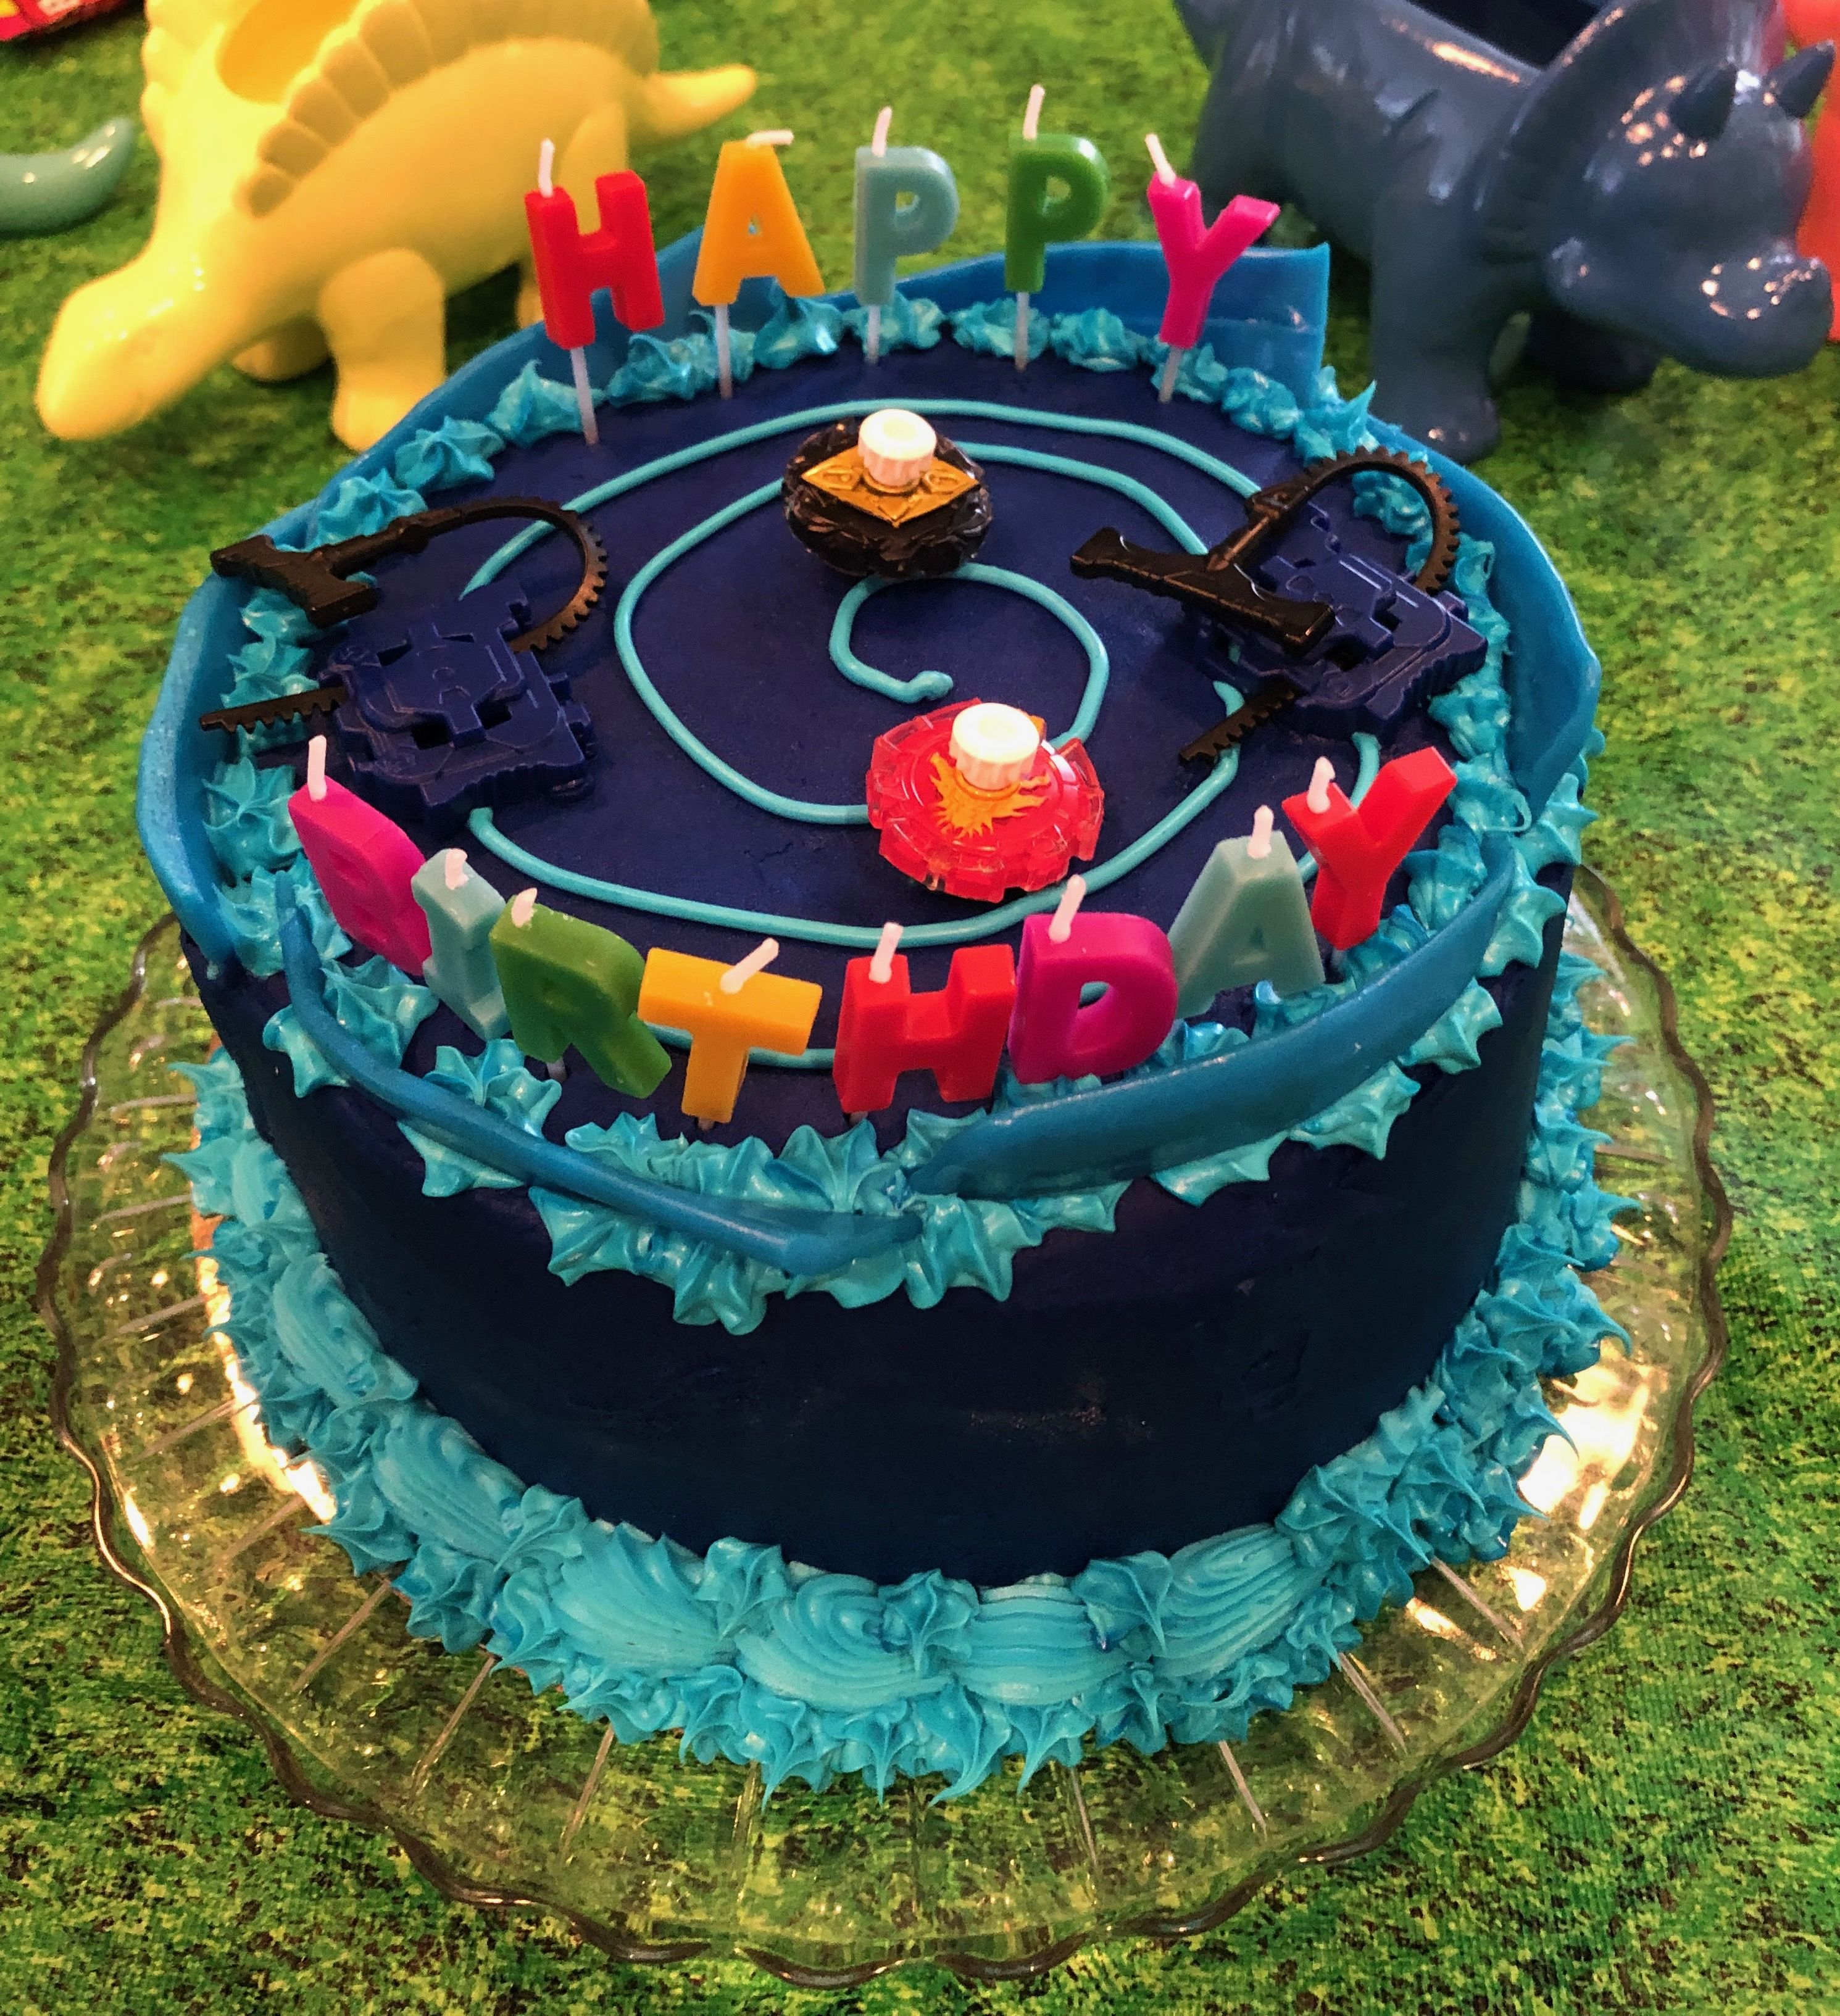 cake cutting knife for birthday